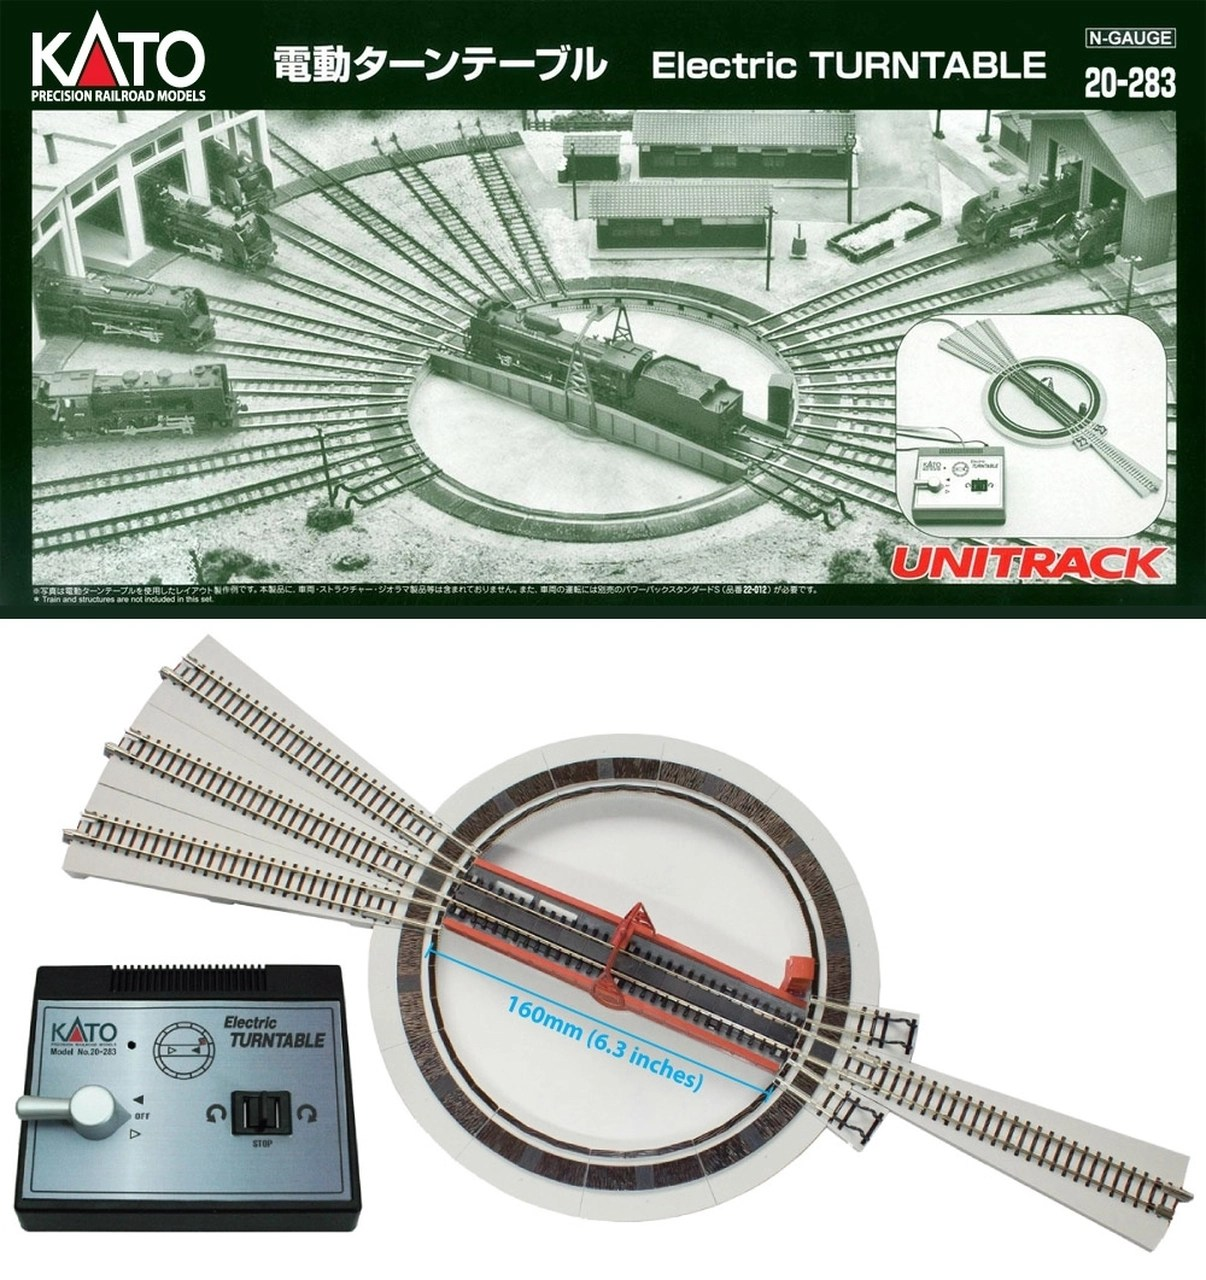 small resolution of kato n 20 283 motorized turntable dcc friendly modeltrainstuff comkato n 20283 motorized turntable